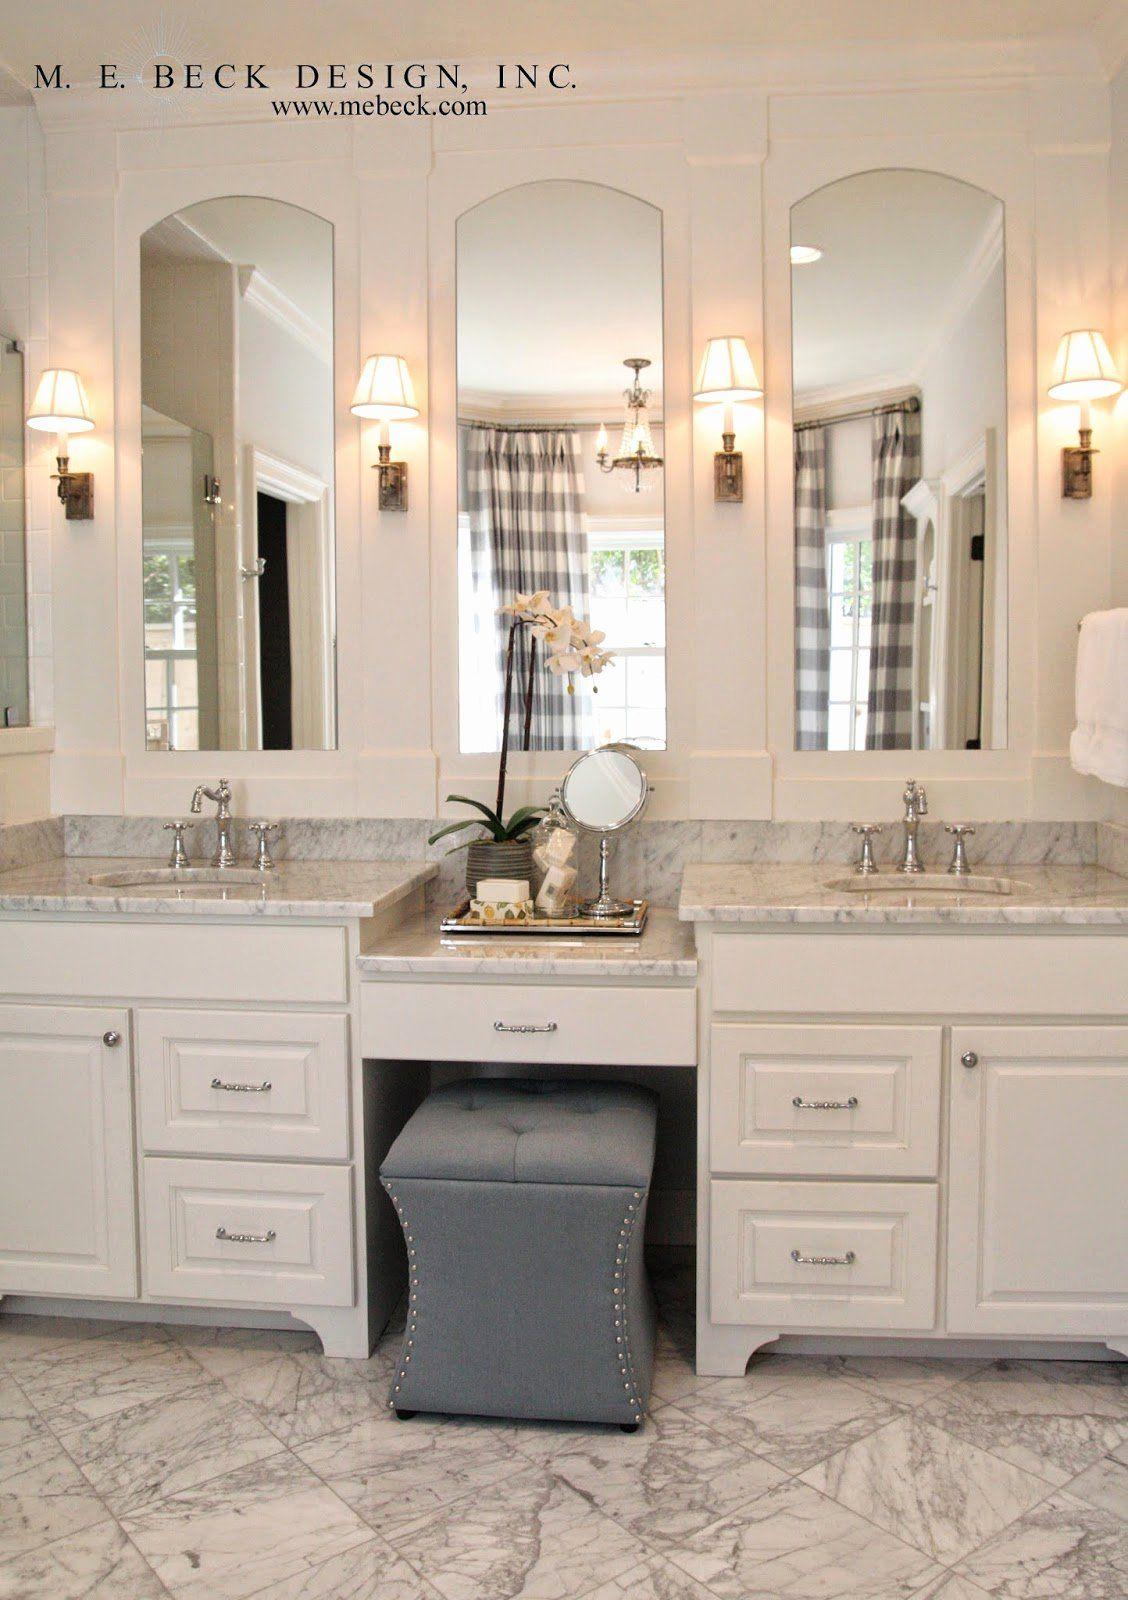 Bathroom Vanity Mirror Ideas Fresh Live Beautifully Center Hall Colonial In 2020 Double Vanity Bathroom Bathroom Remodel Master Master Bath Vanity